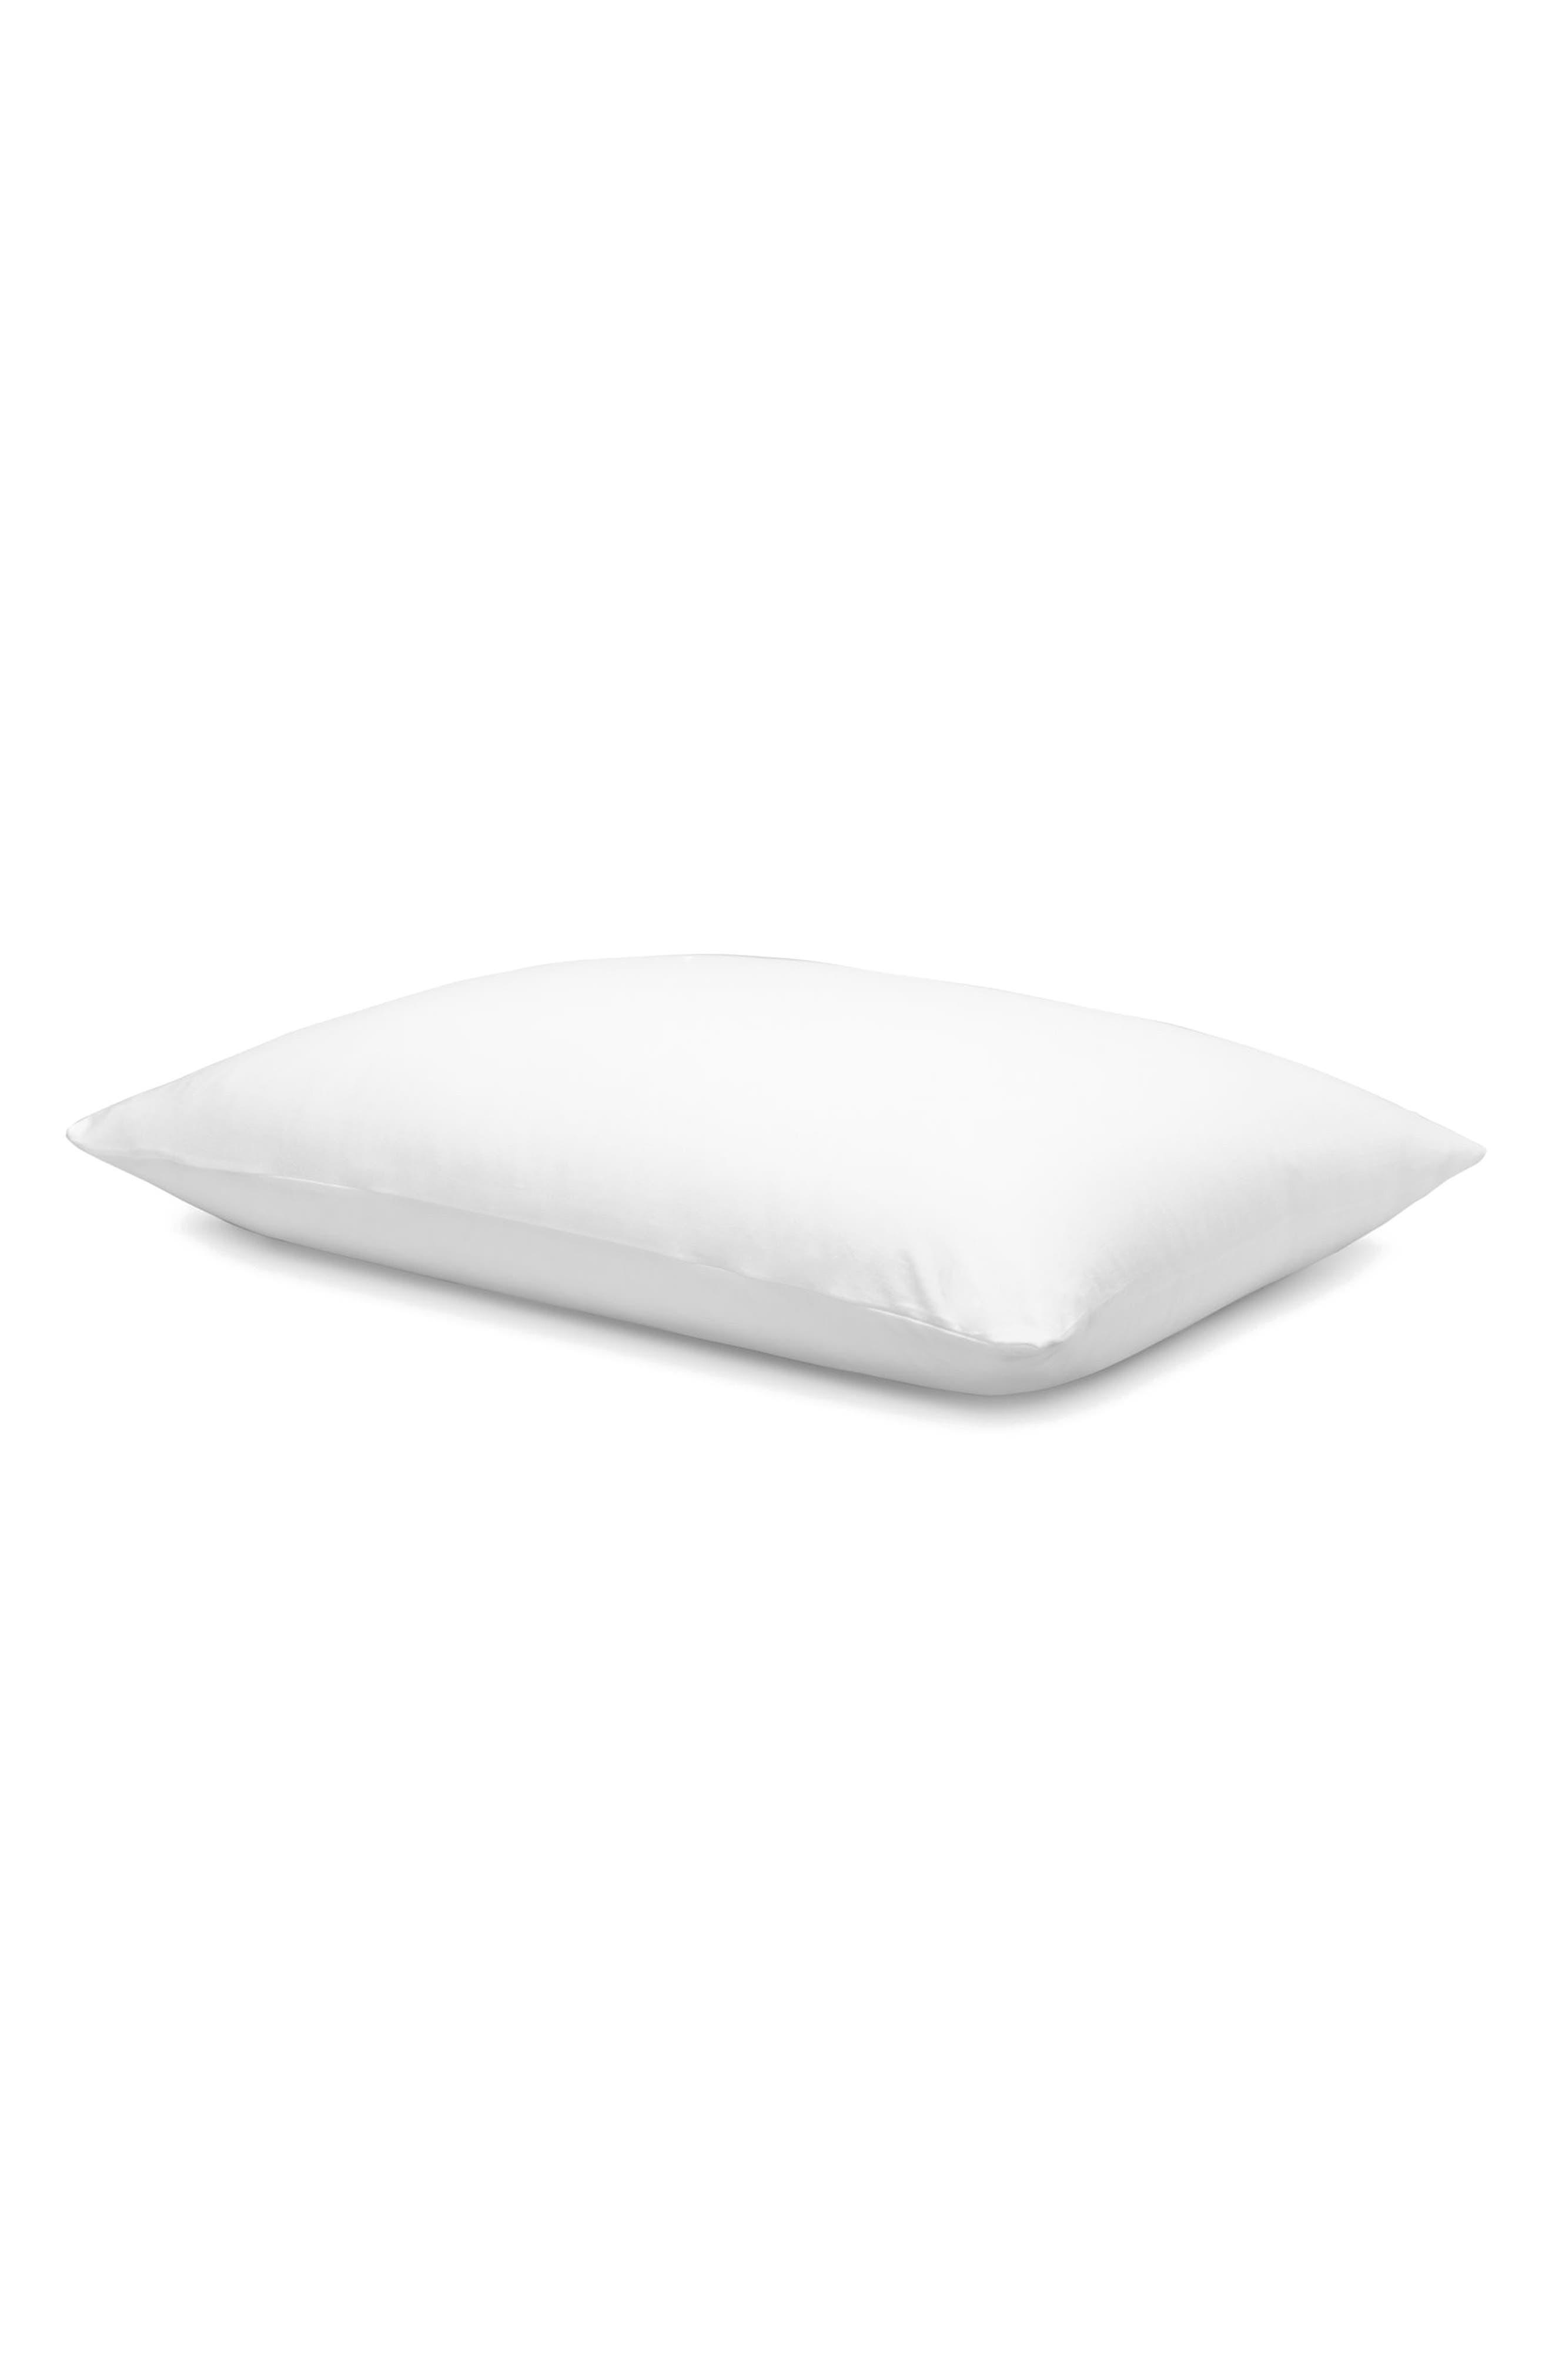 CALVIN KLEIN HOME,                             Harrison Pillowcases,                             Main thumbnail 1, color,                             WHITE